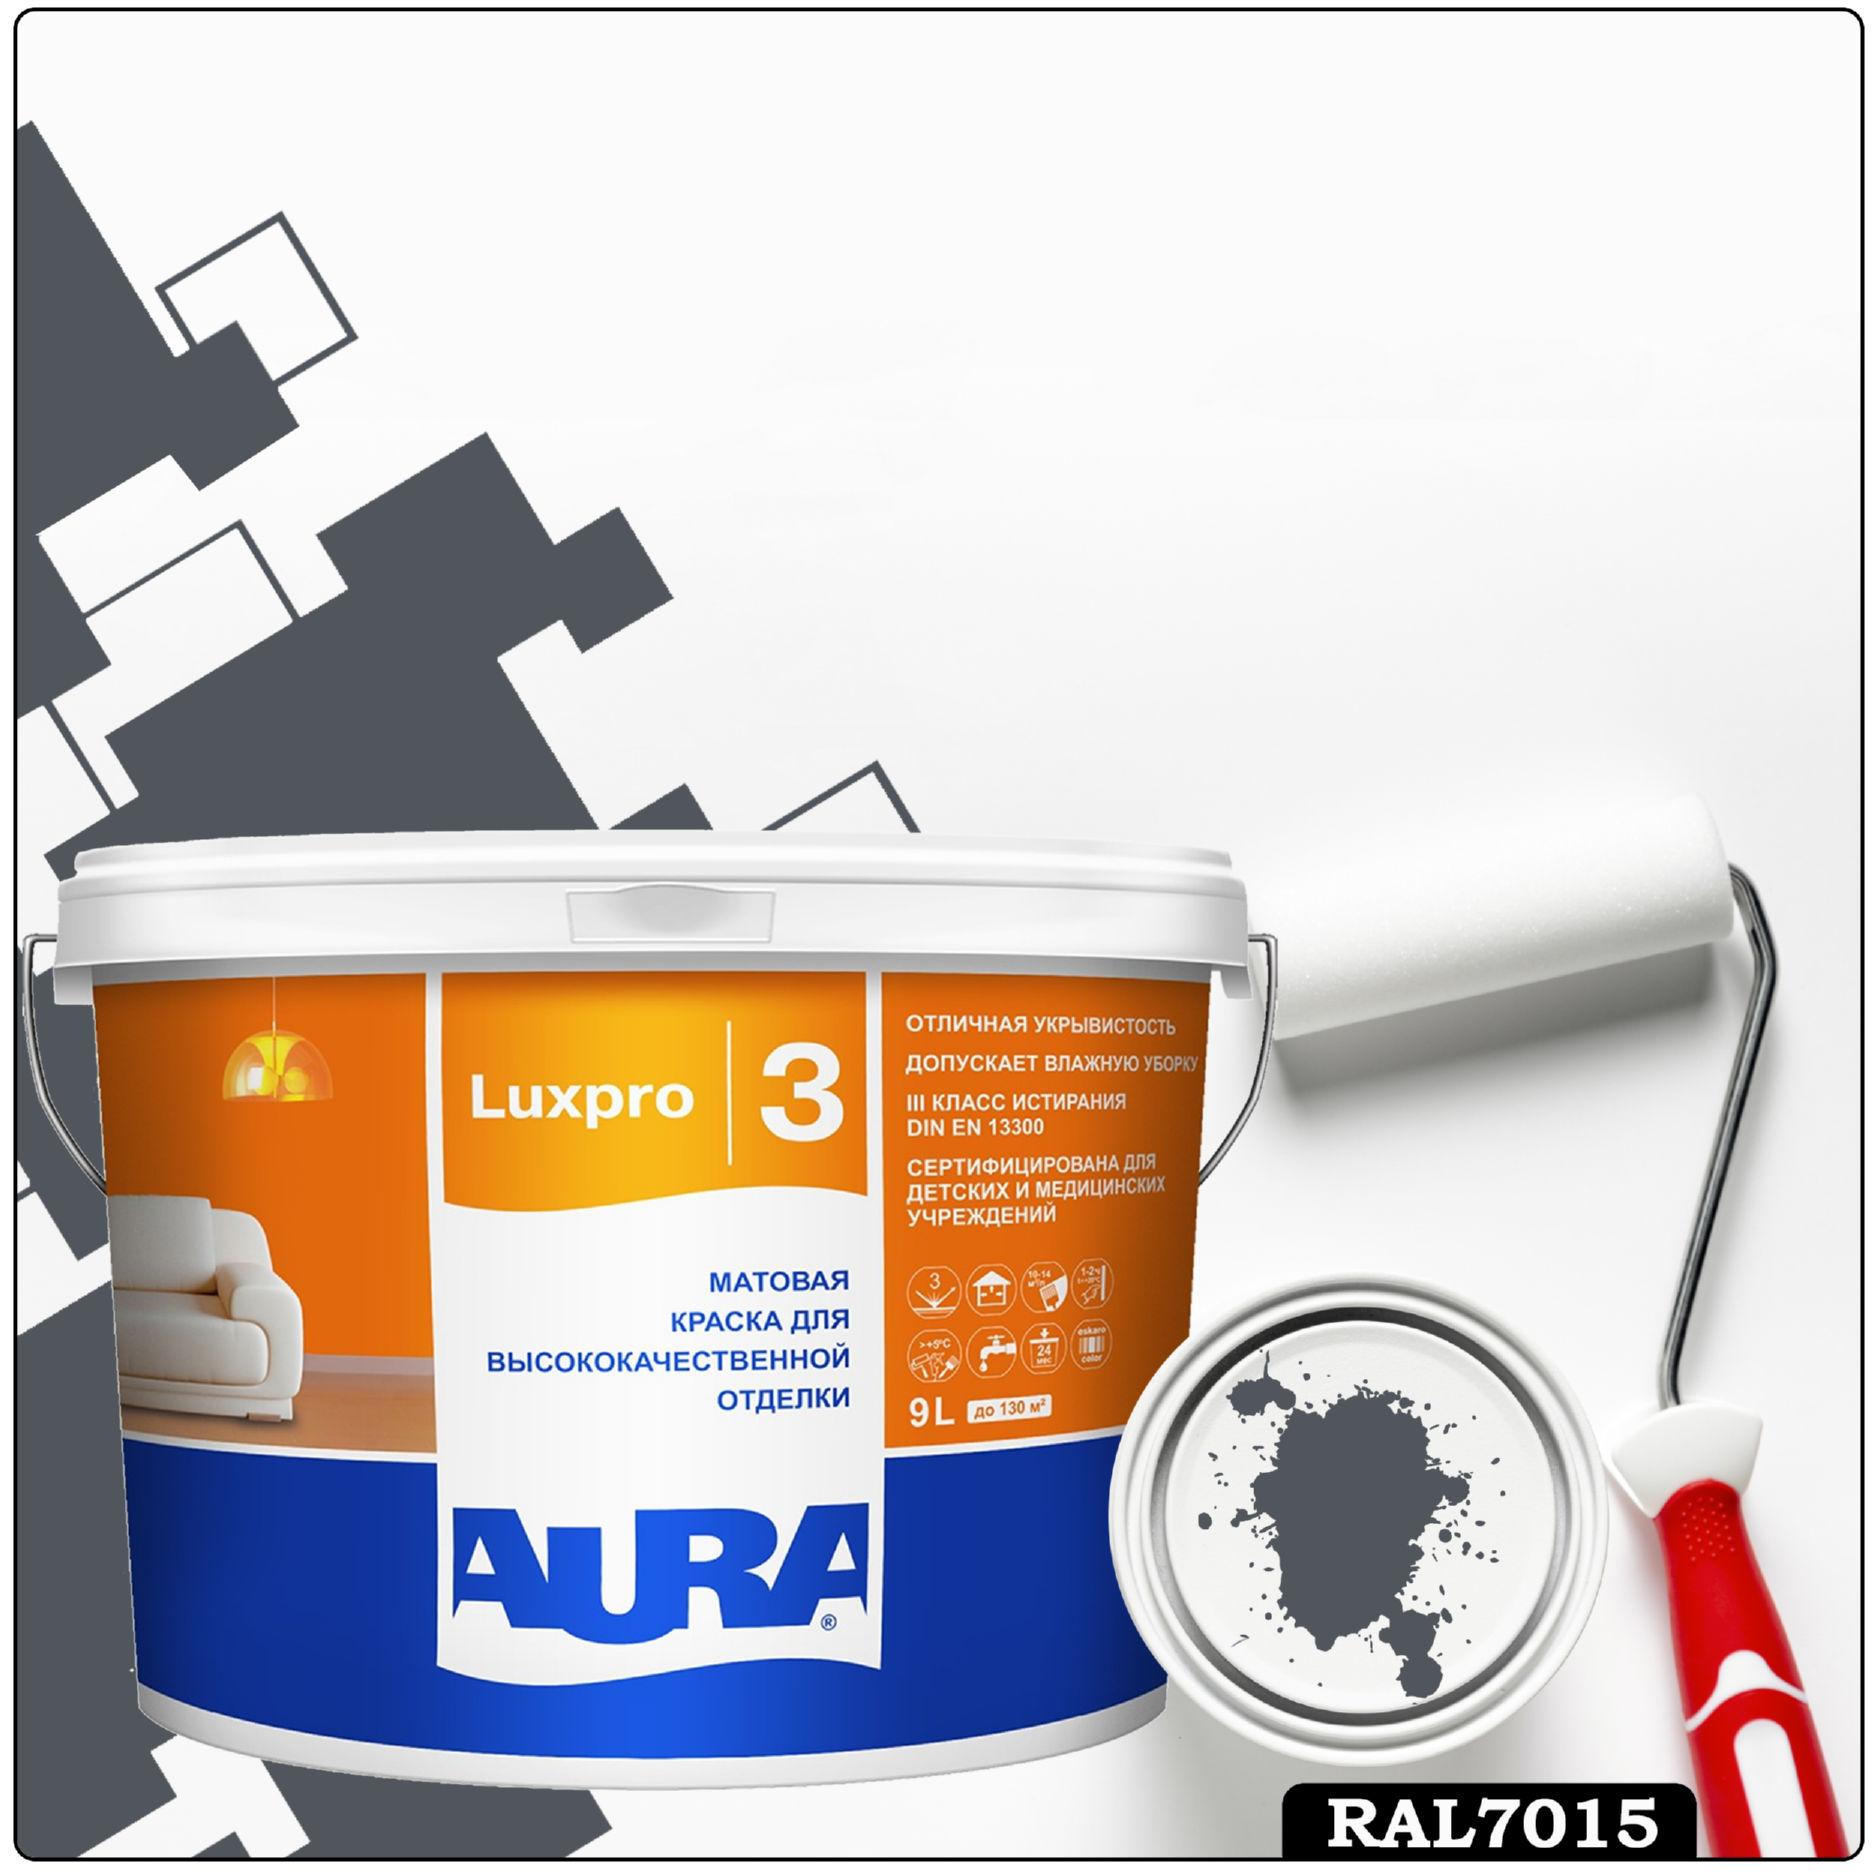 Фото 14 - Краска Aura LuxPRO 3, RAL 7015 Серый сланец, латексная, шелково-матовая, интерьерная, 9л, Аура.